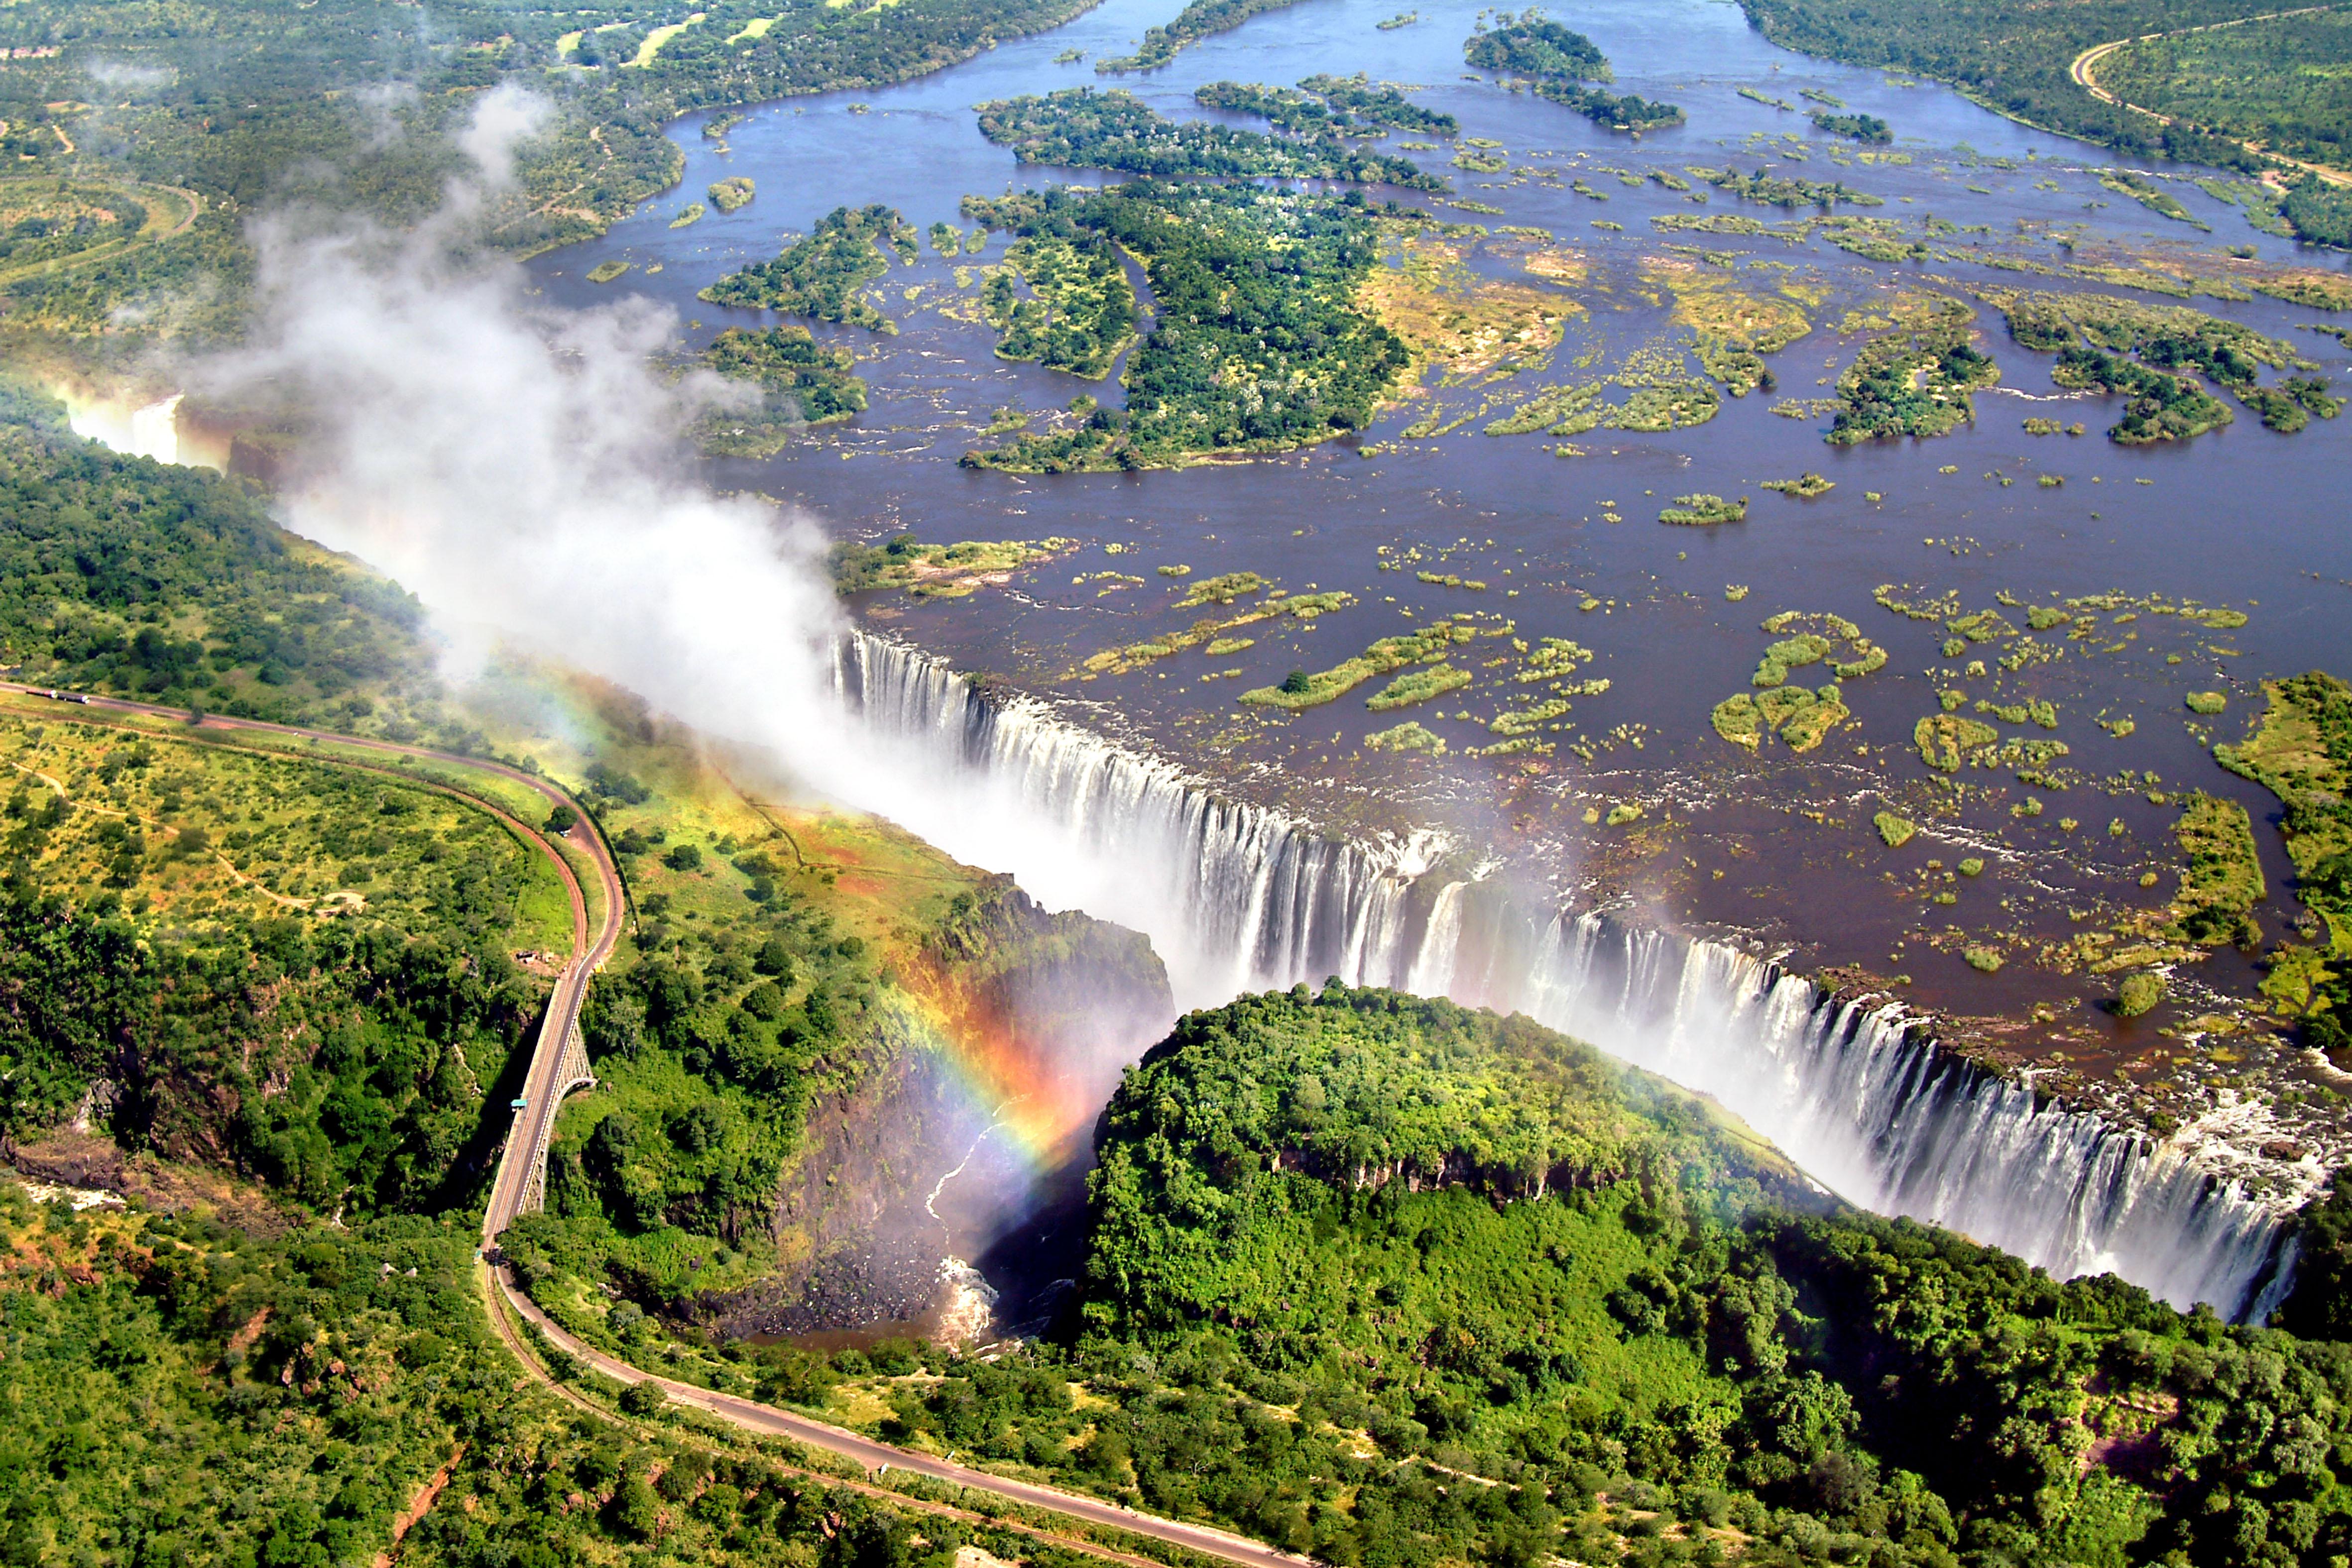 Victoria Falls located in Africa